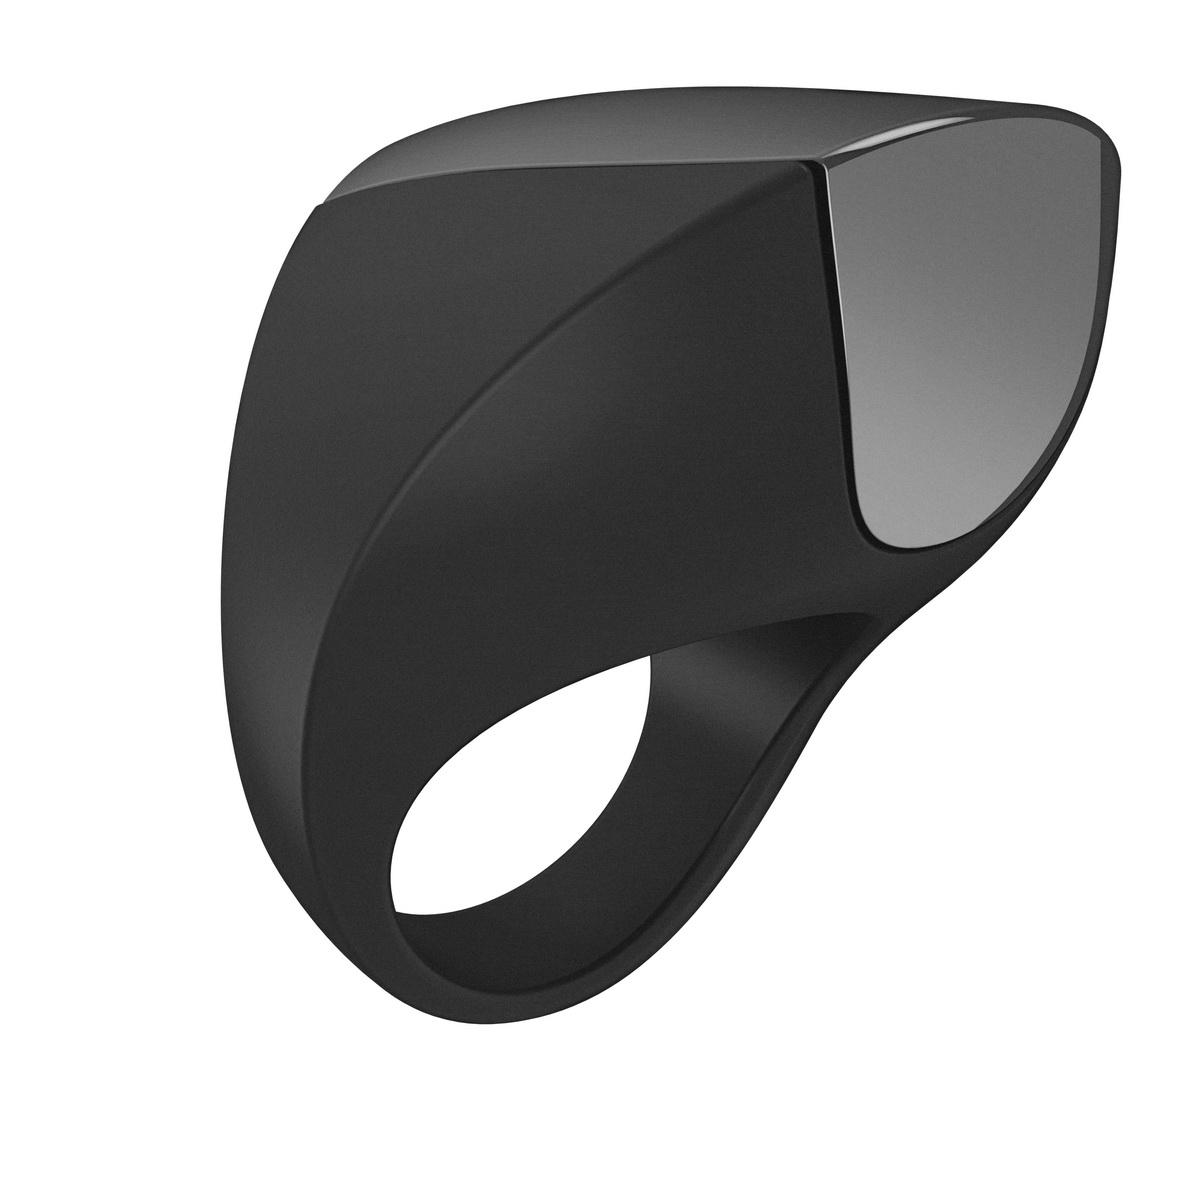 Ovo - A1 dobíjecí erekční kroužek černý - chrom